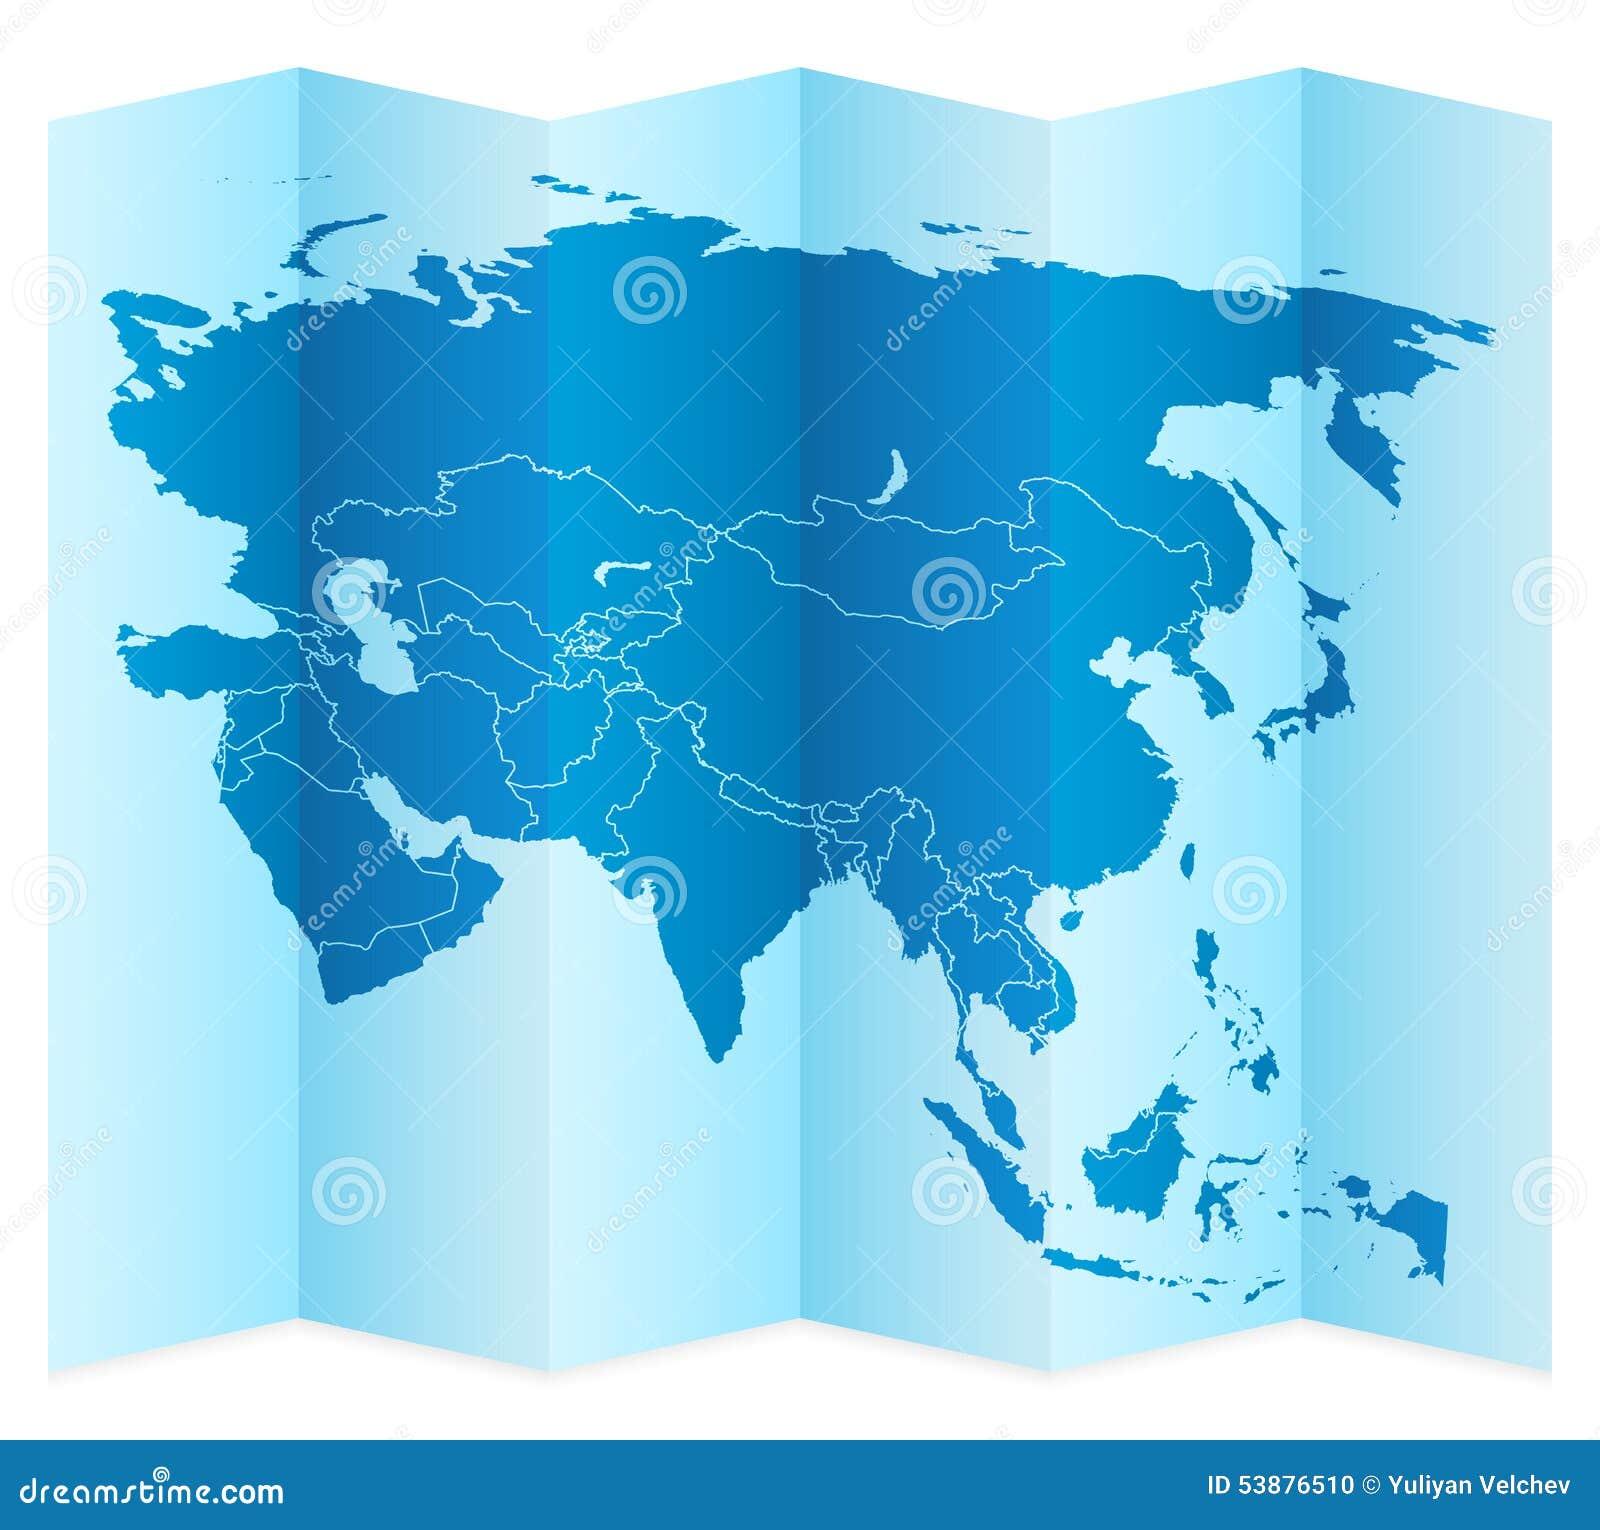 Asia map stock vector. Illustration of folded, outline - 53876510